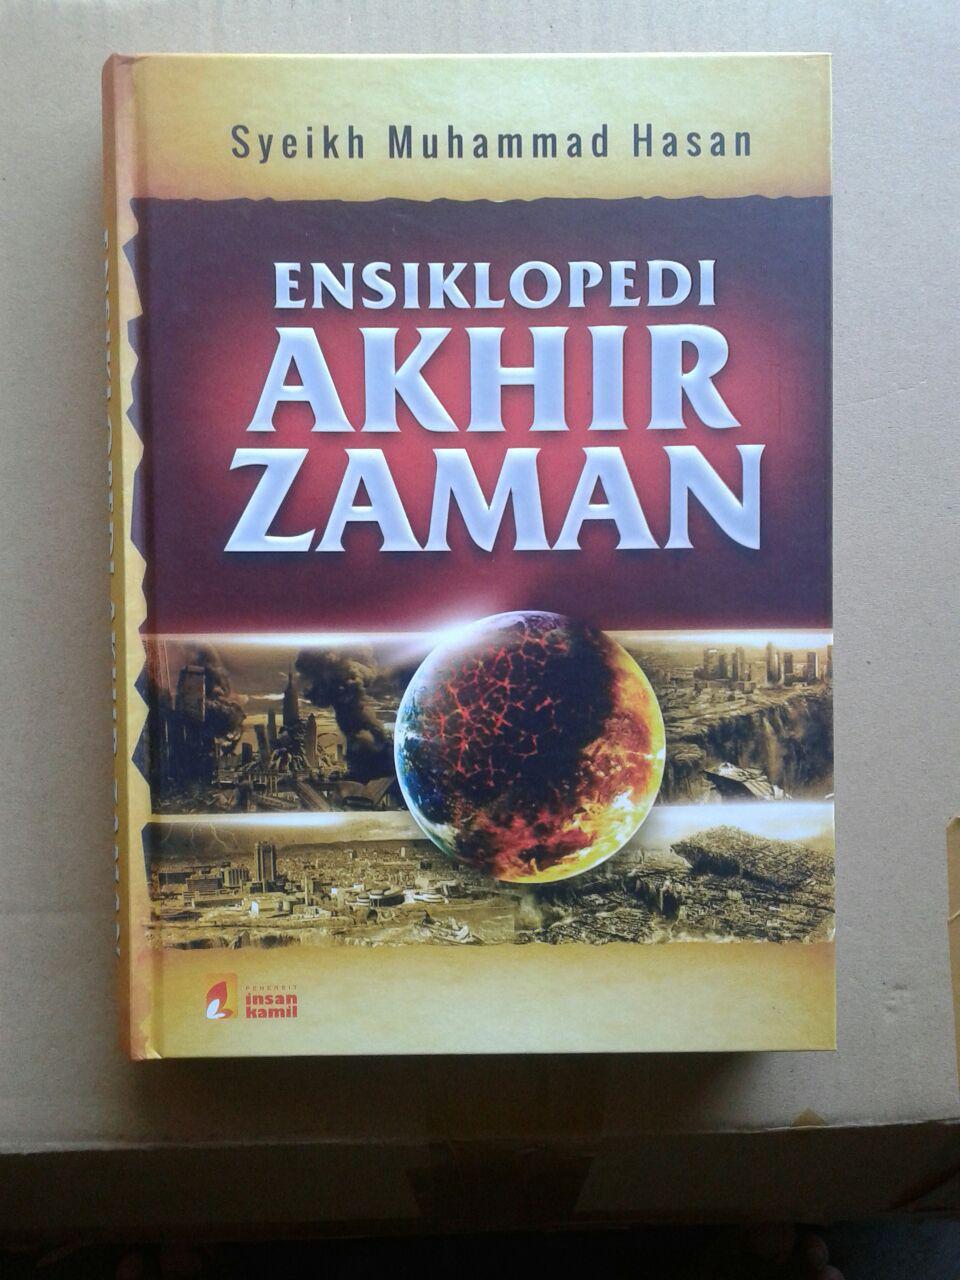 Buku Ensiklopedi Akhir Zaman Cover